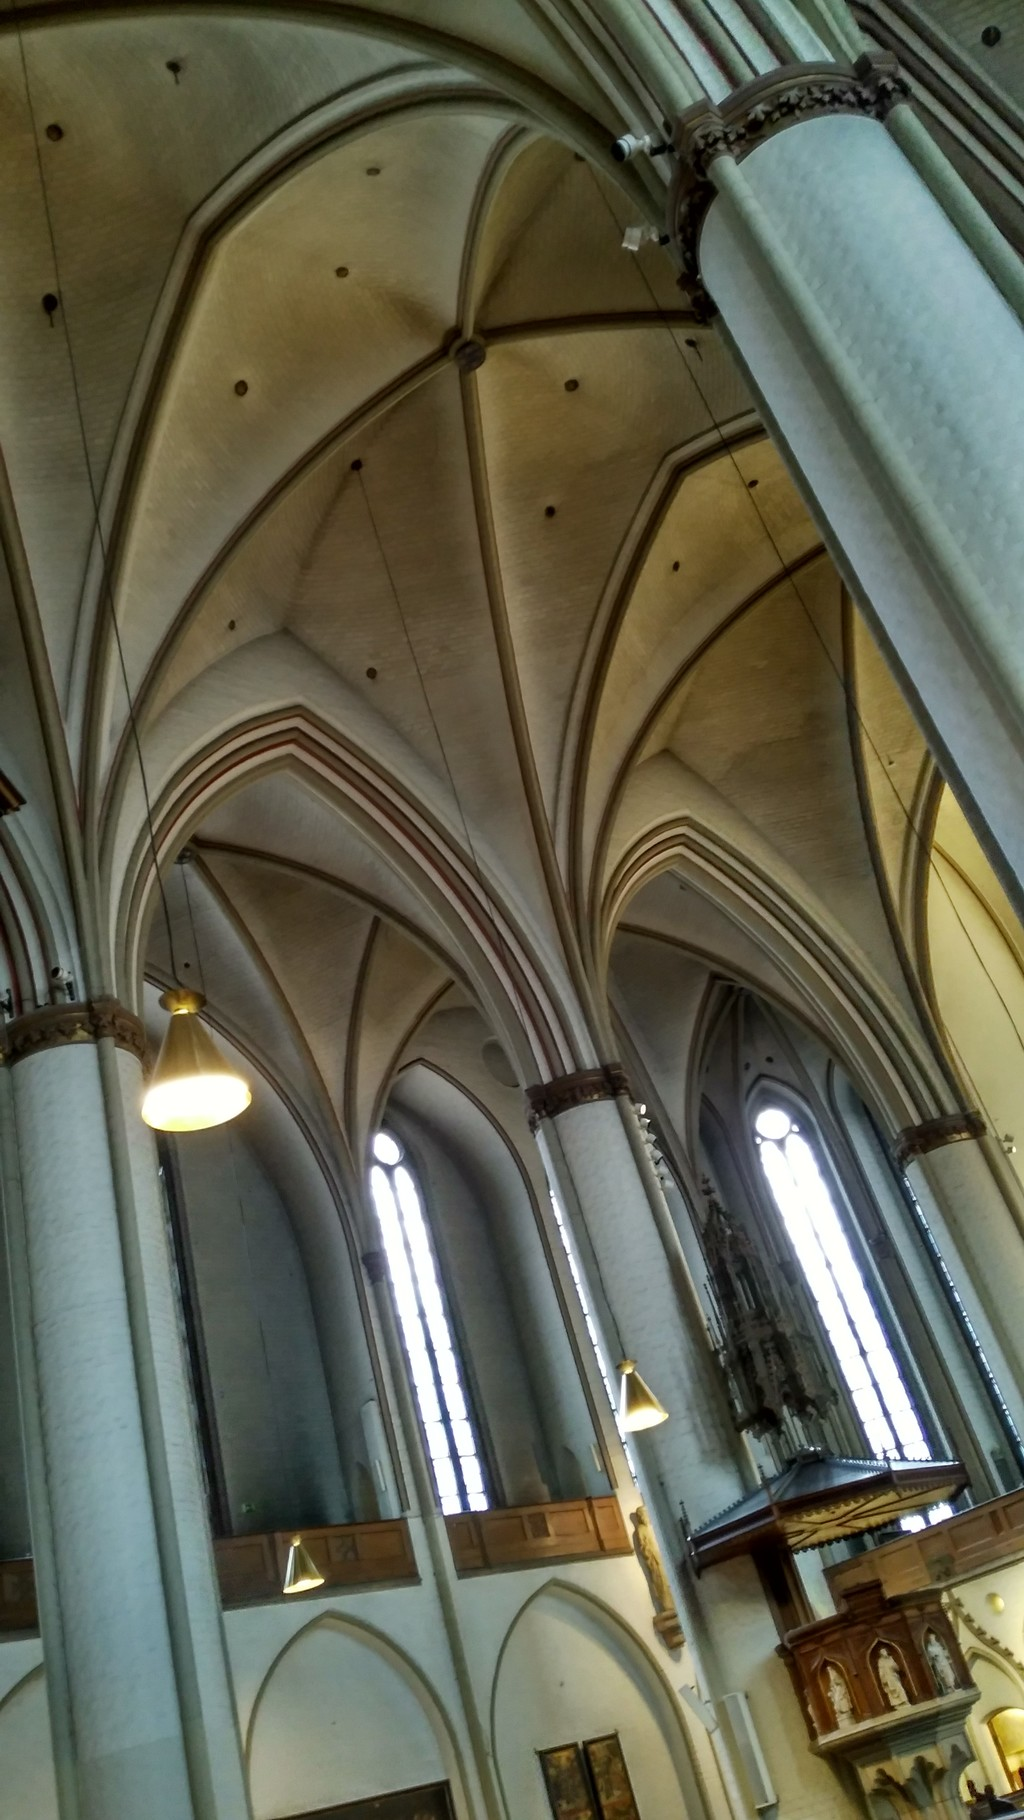 excursiones-bremen-hamburgo-c1e82d8eeb6f